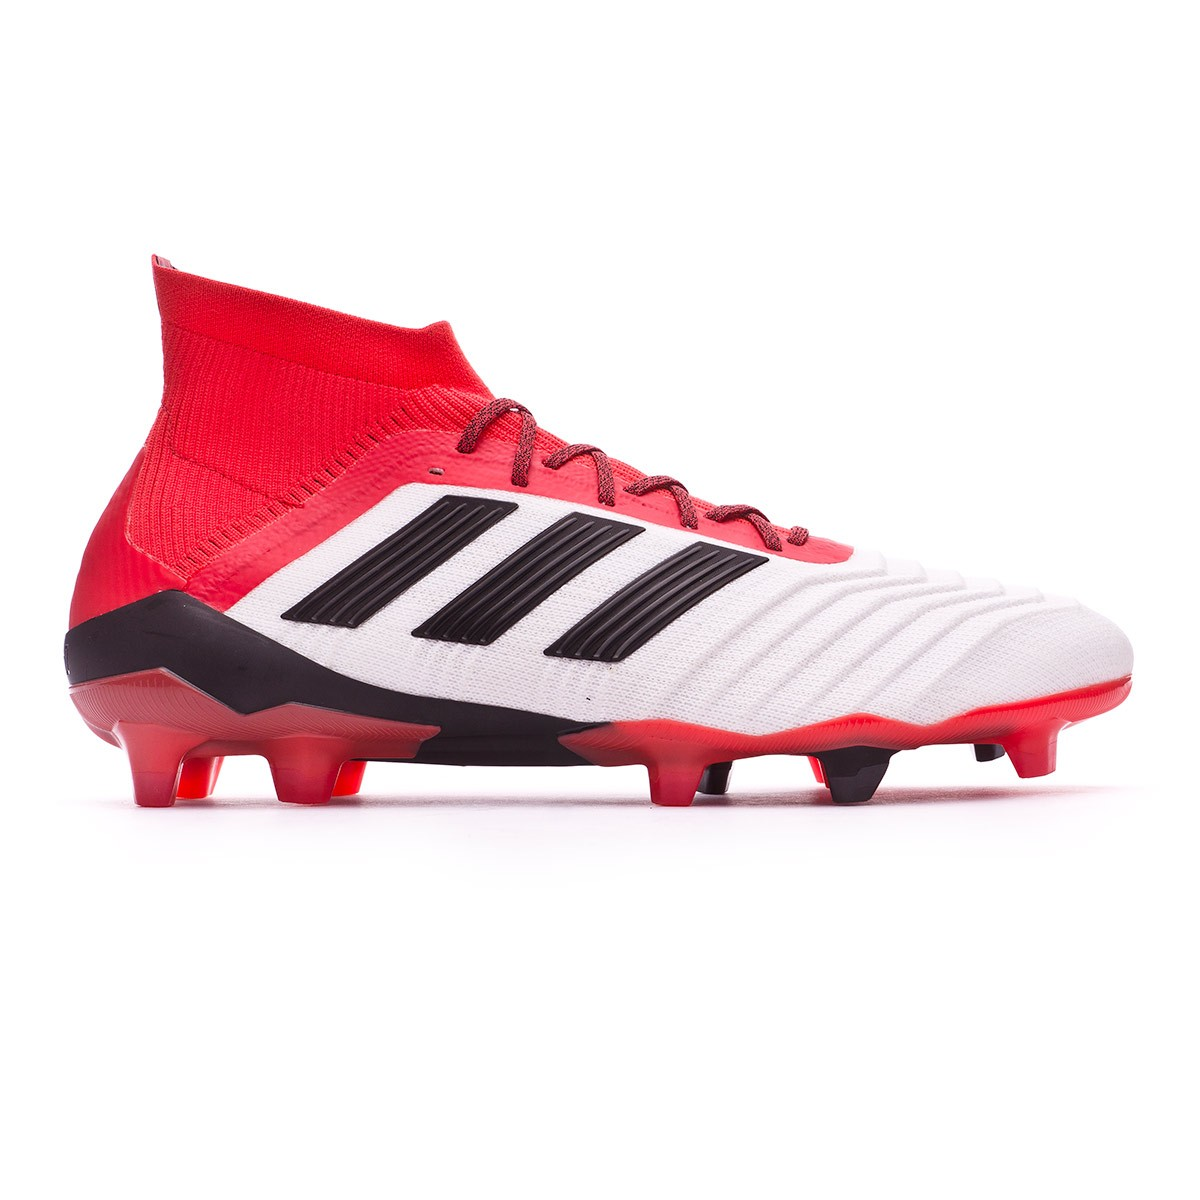 31a6e439c Football Boots adidas Predator 18.1 FG White-Core black-Real coral -  Football store Fútbol Emotion